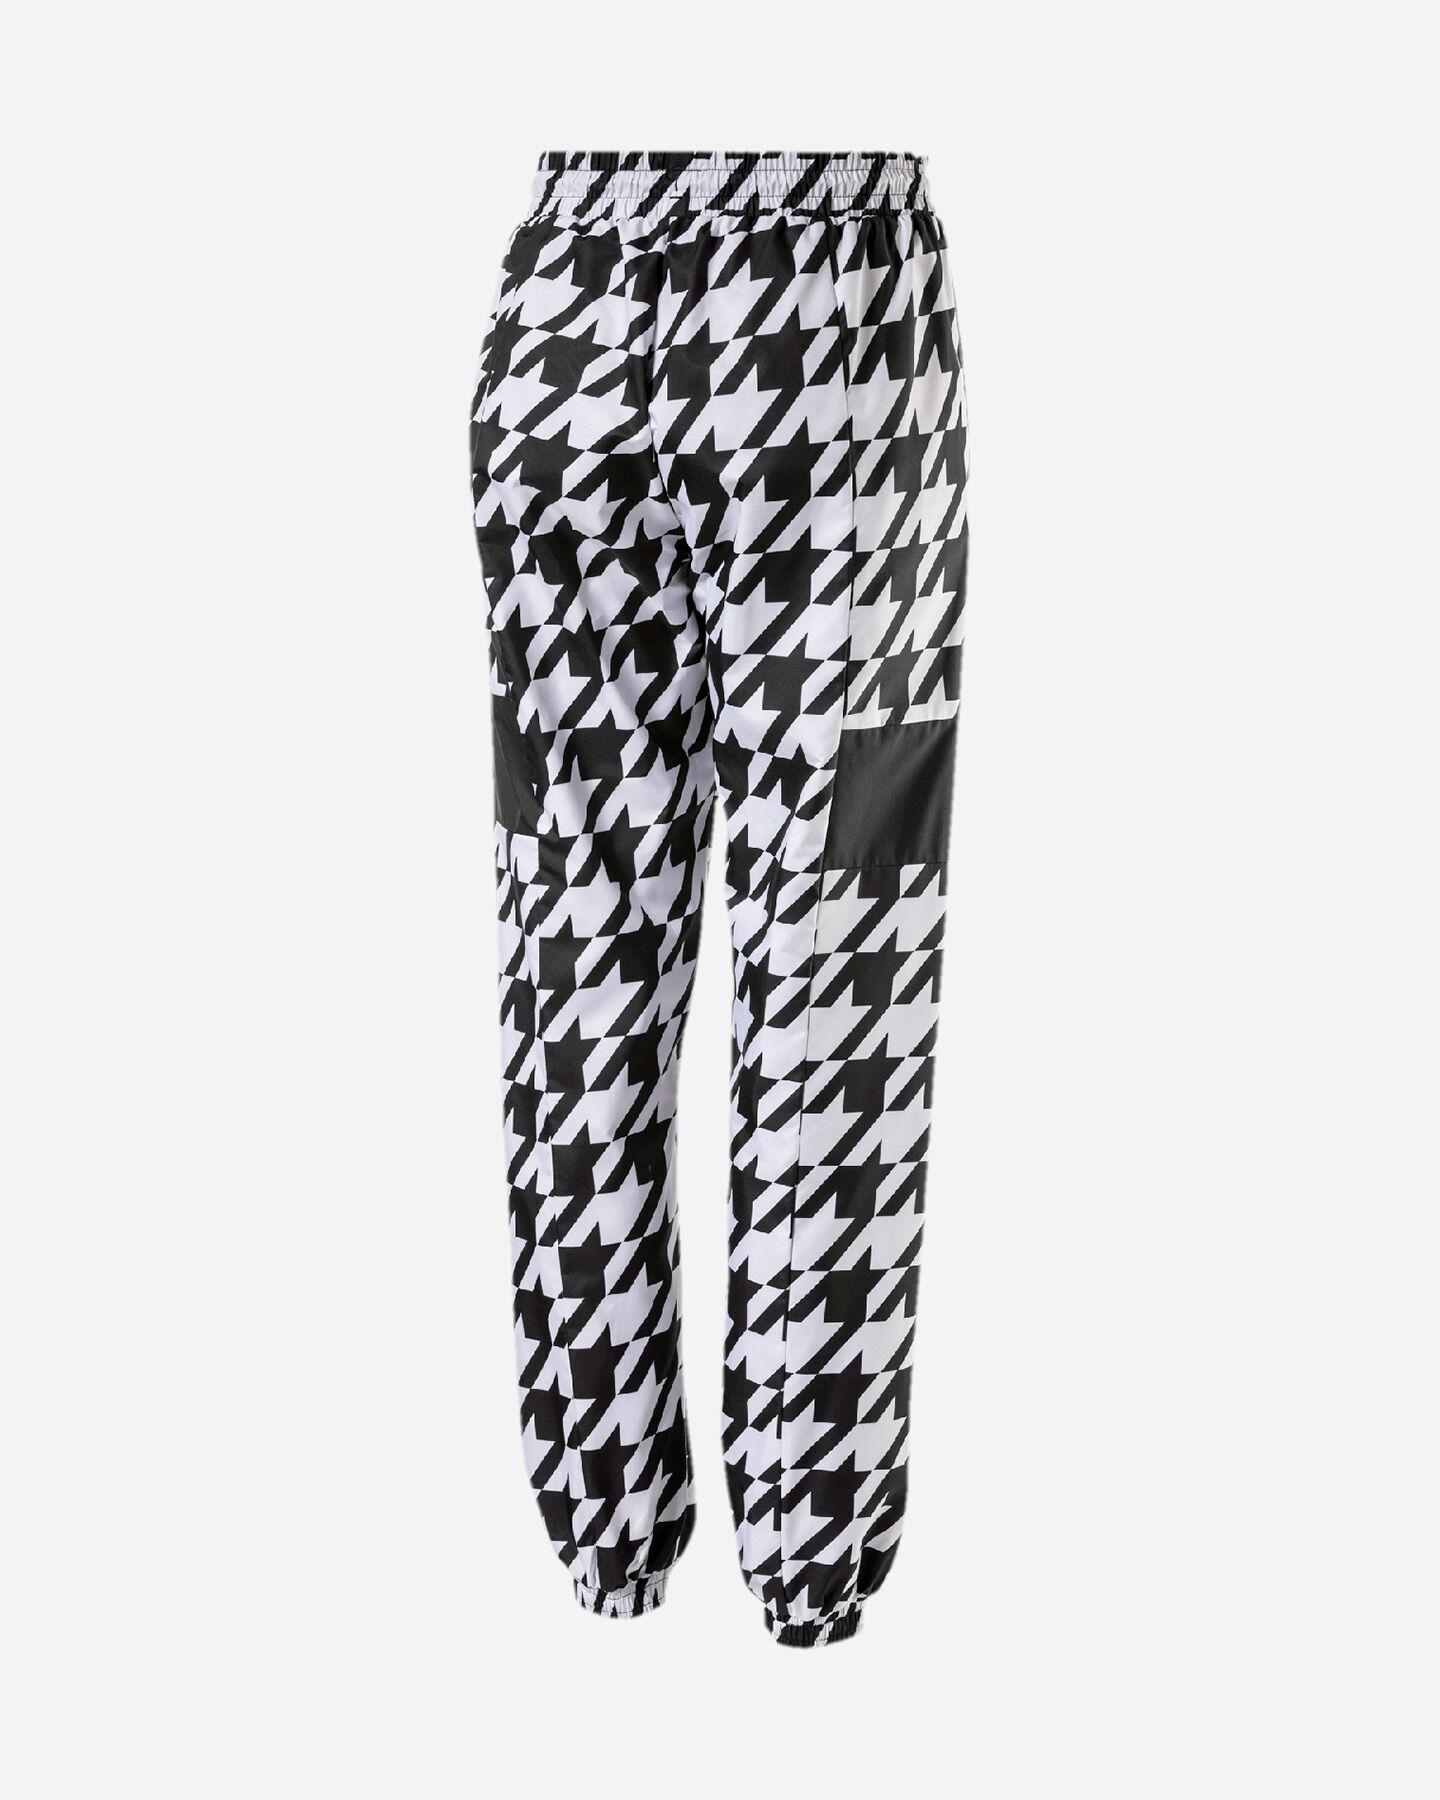 Pantalone PUMA CALI BRUSHED W S5173093 scatto 1